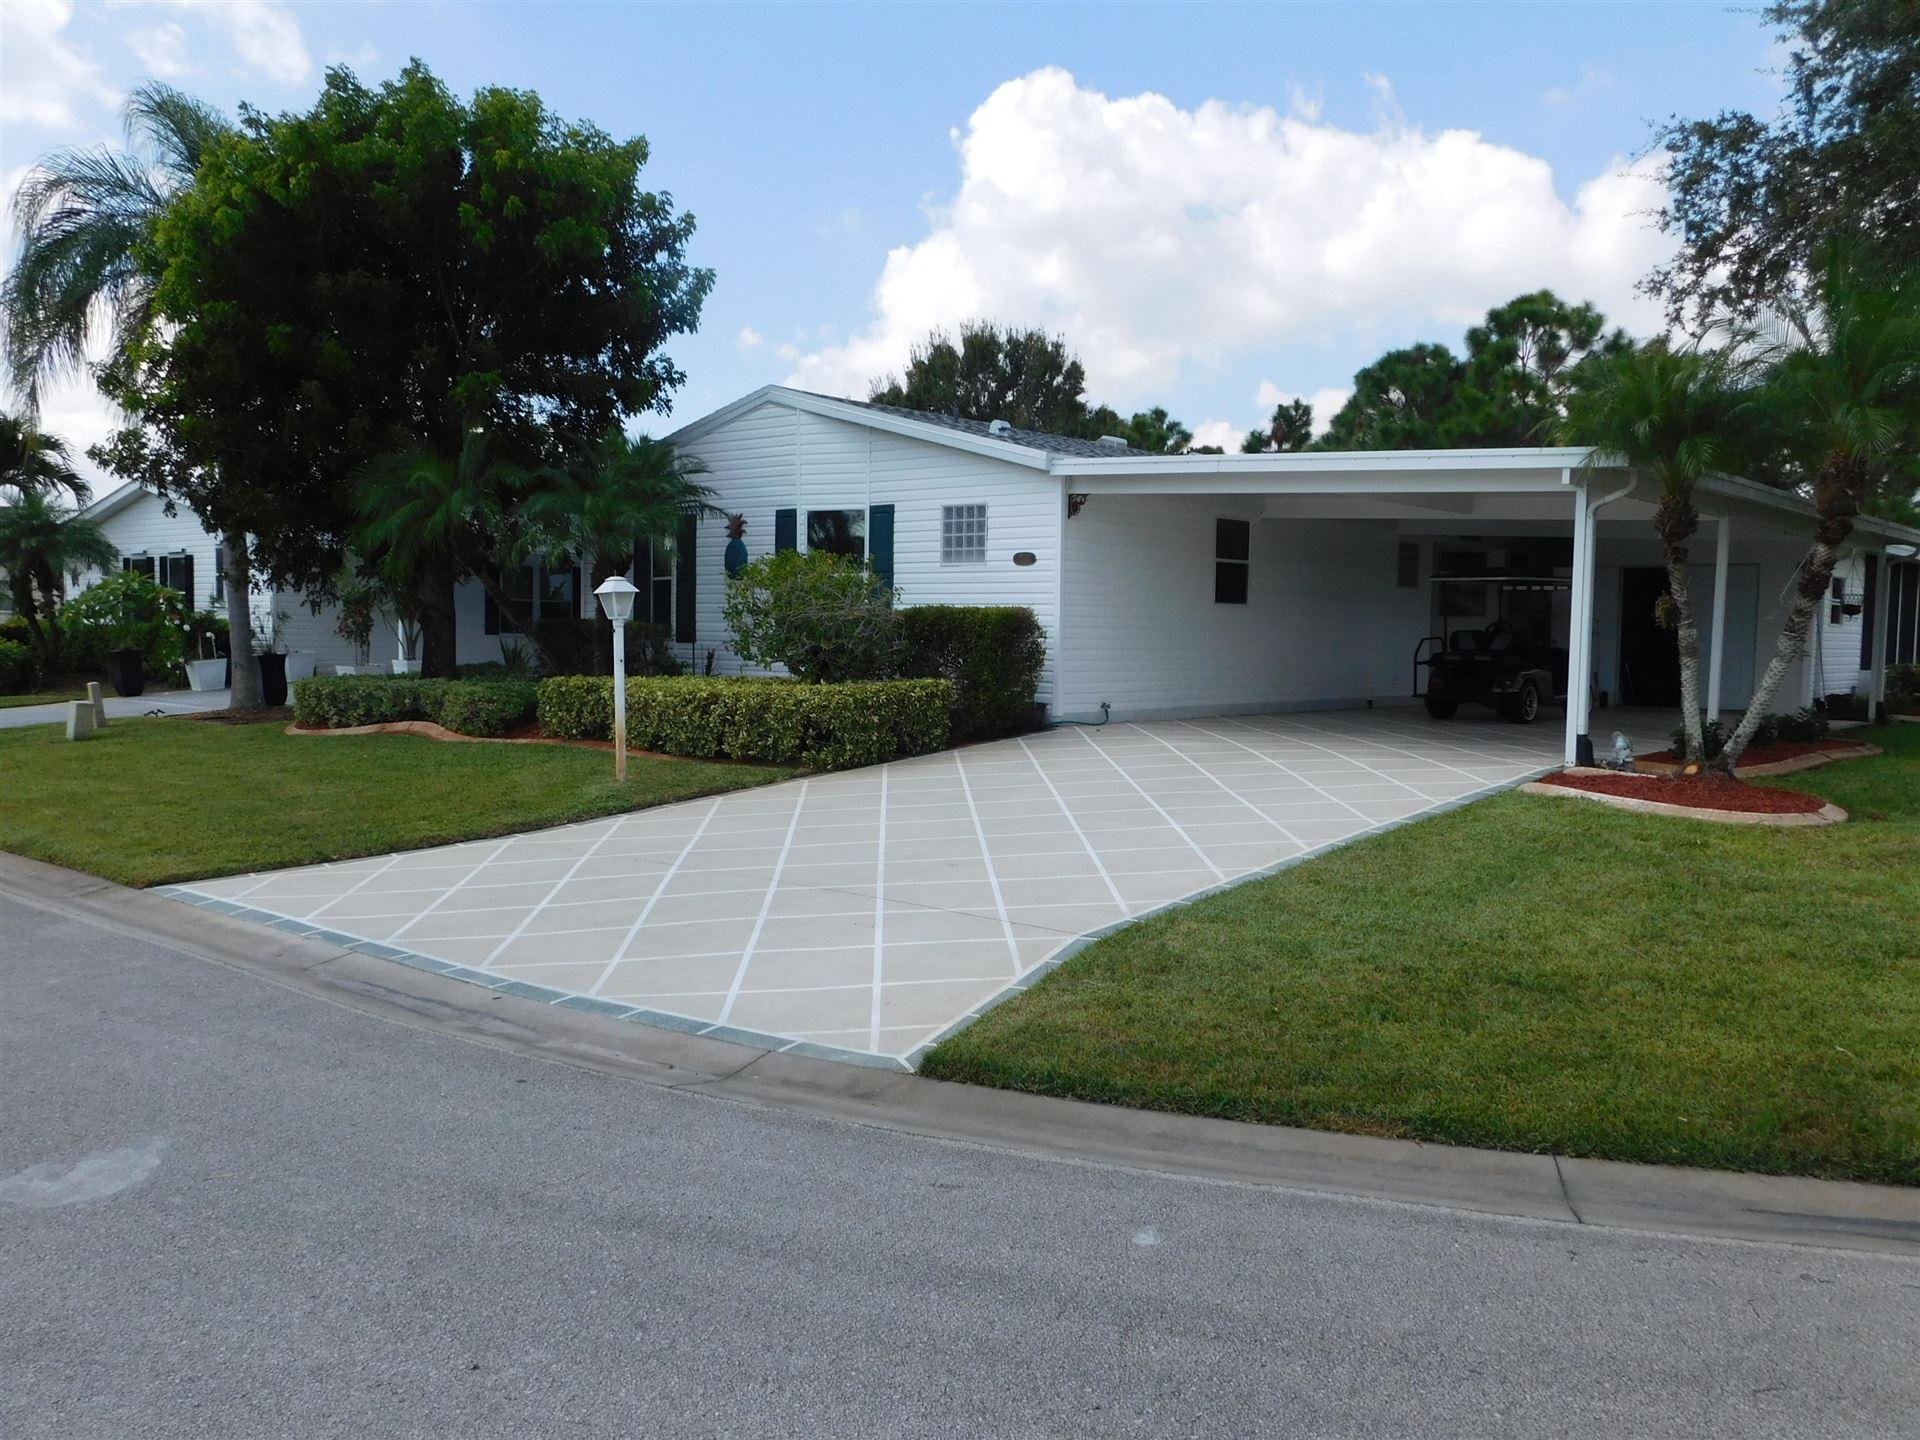 7835 White Ibis Lane, Port Saint Lucie, FL 34952 - #: RX-10657940